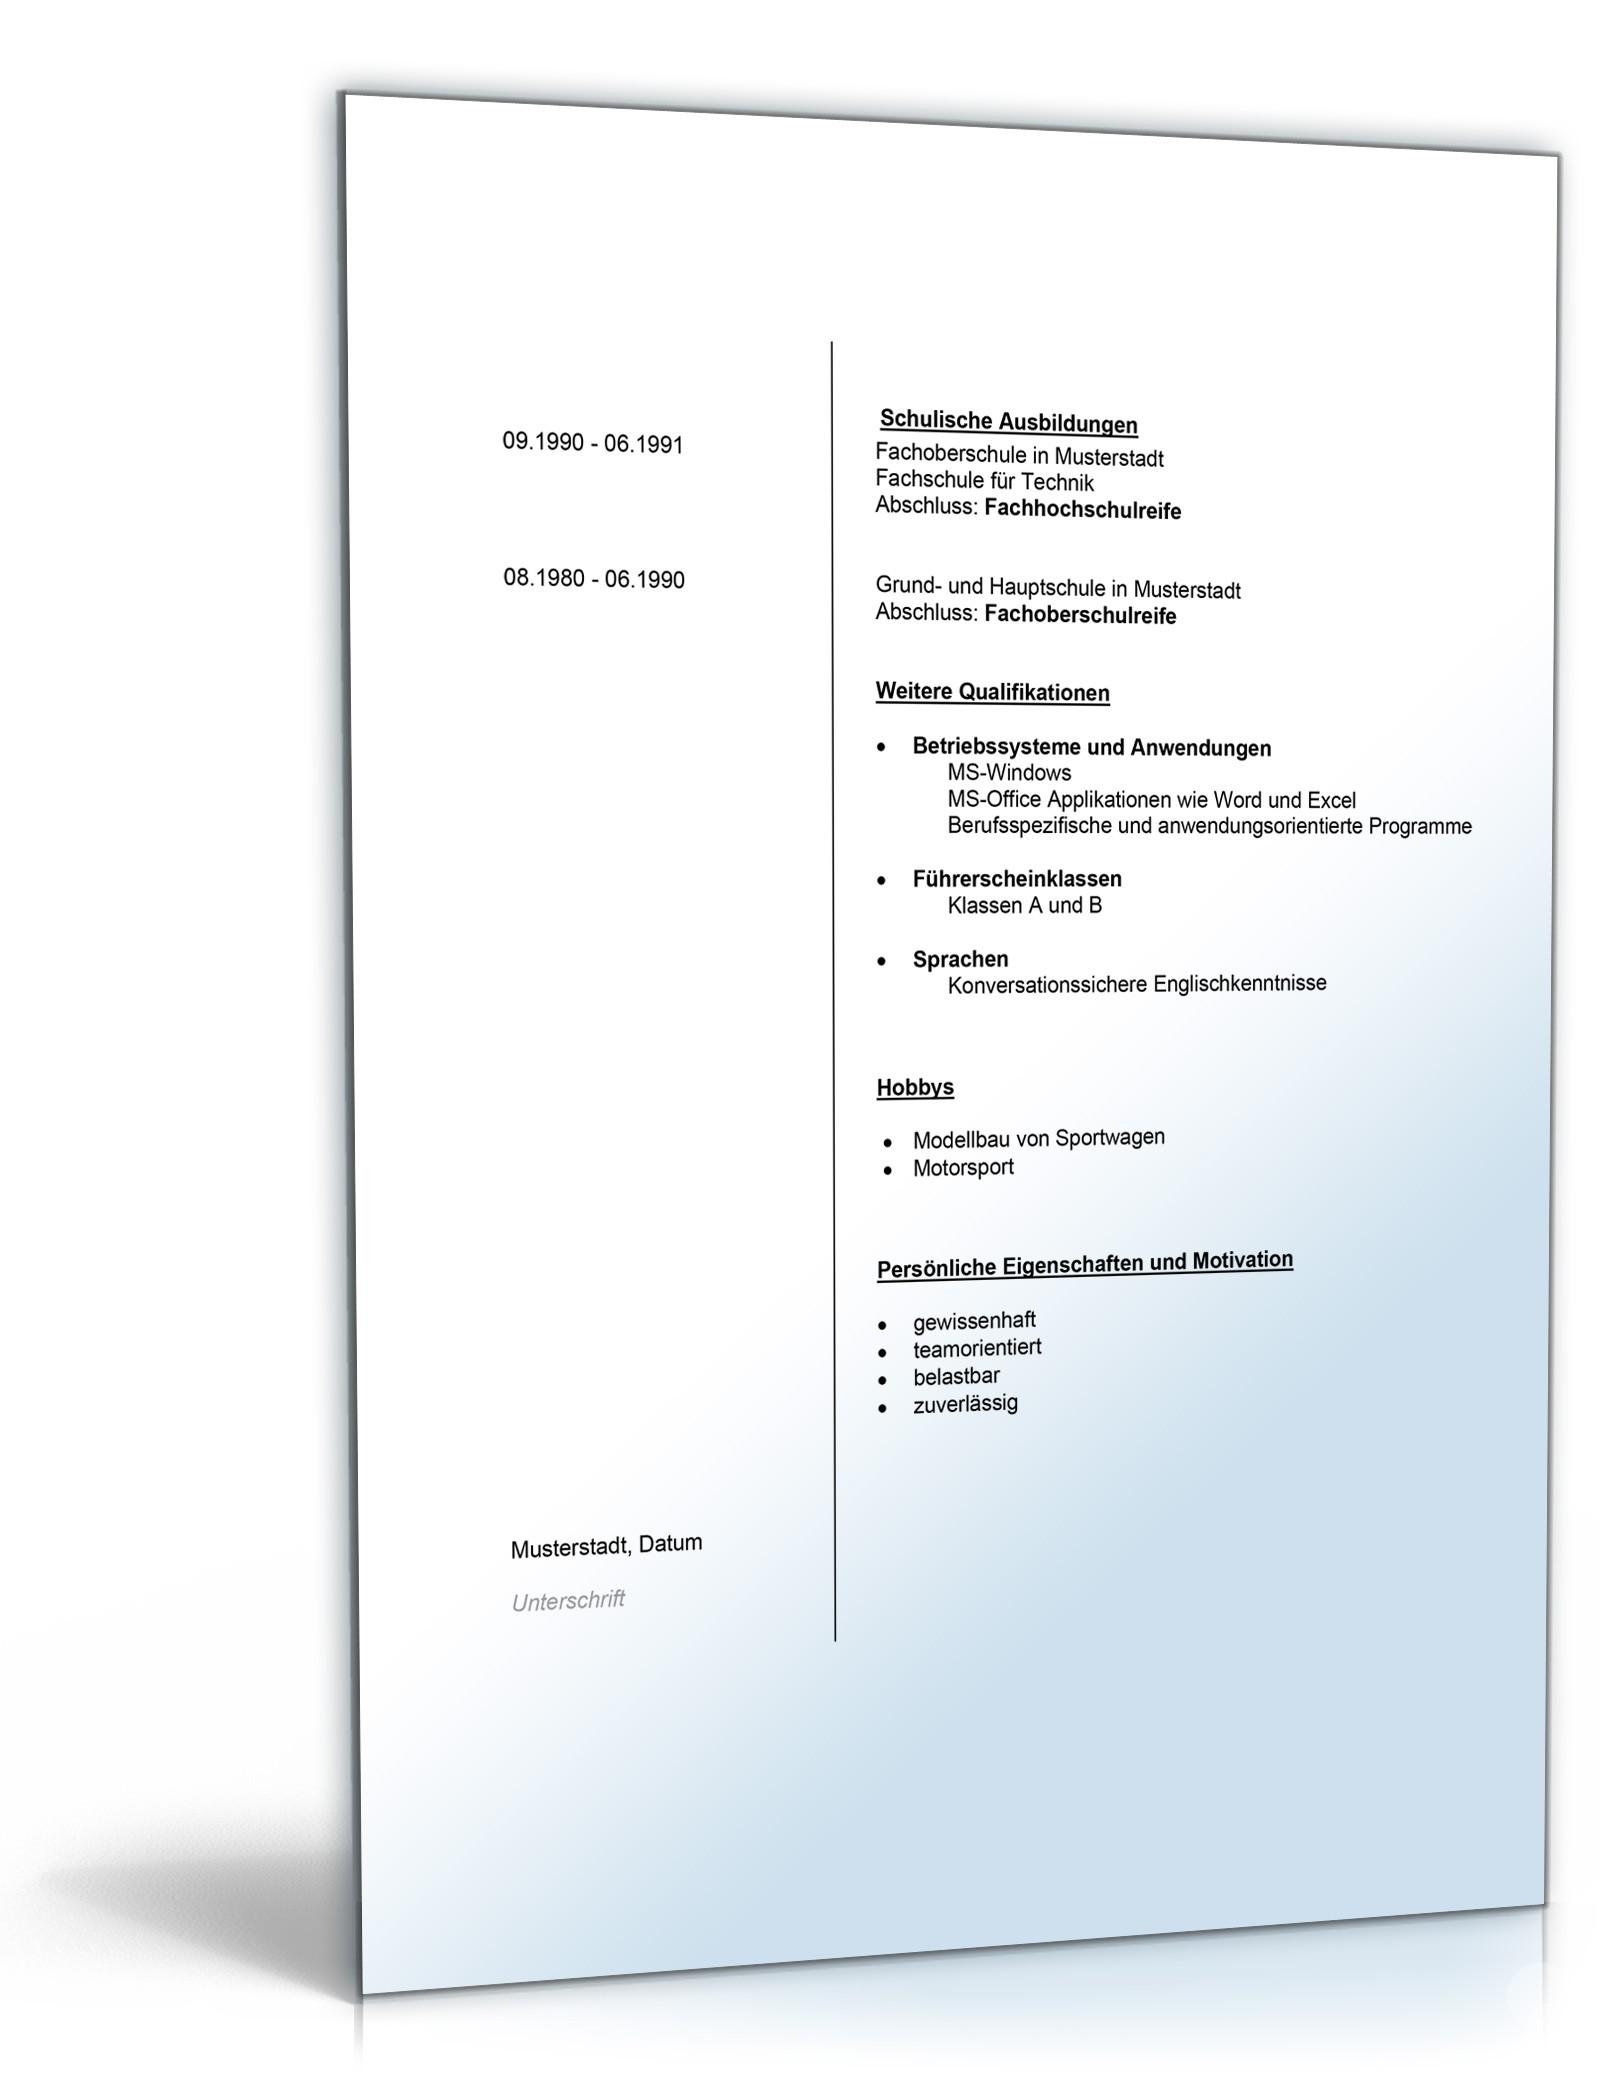 Großzügig Chemie Lebenslauf Probe Galerie - Beispiel Business ...